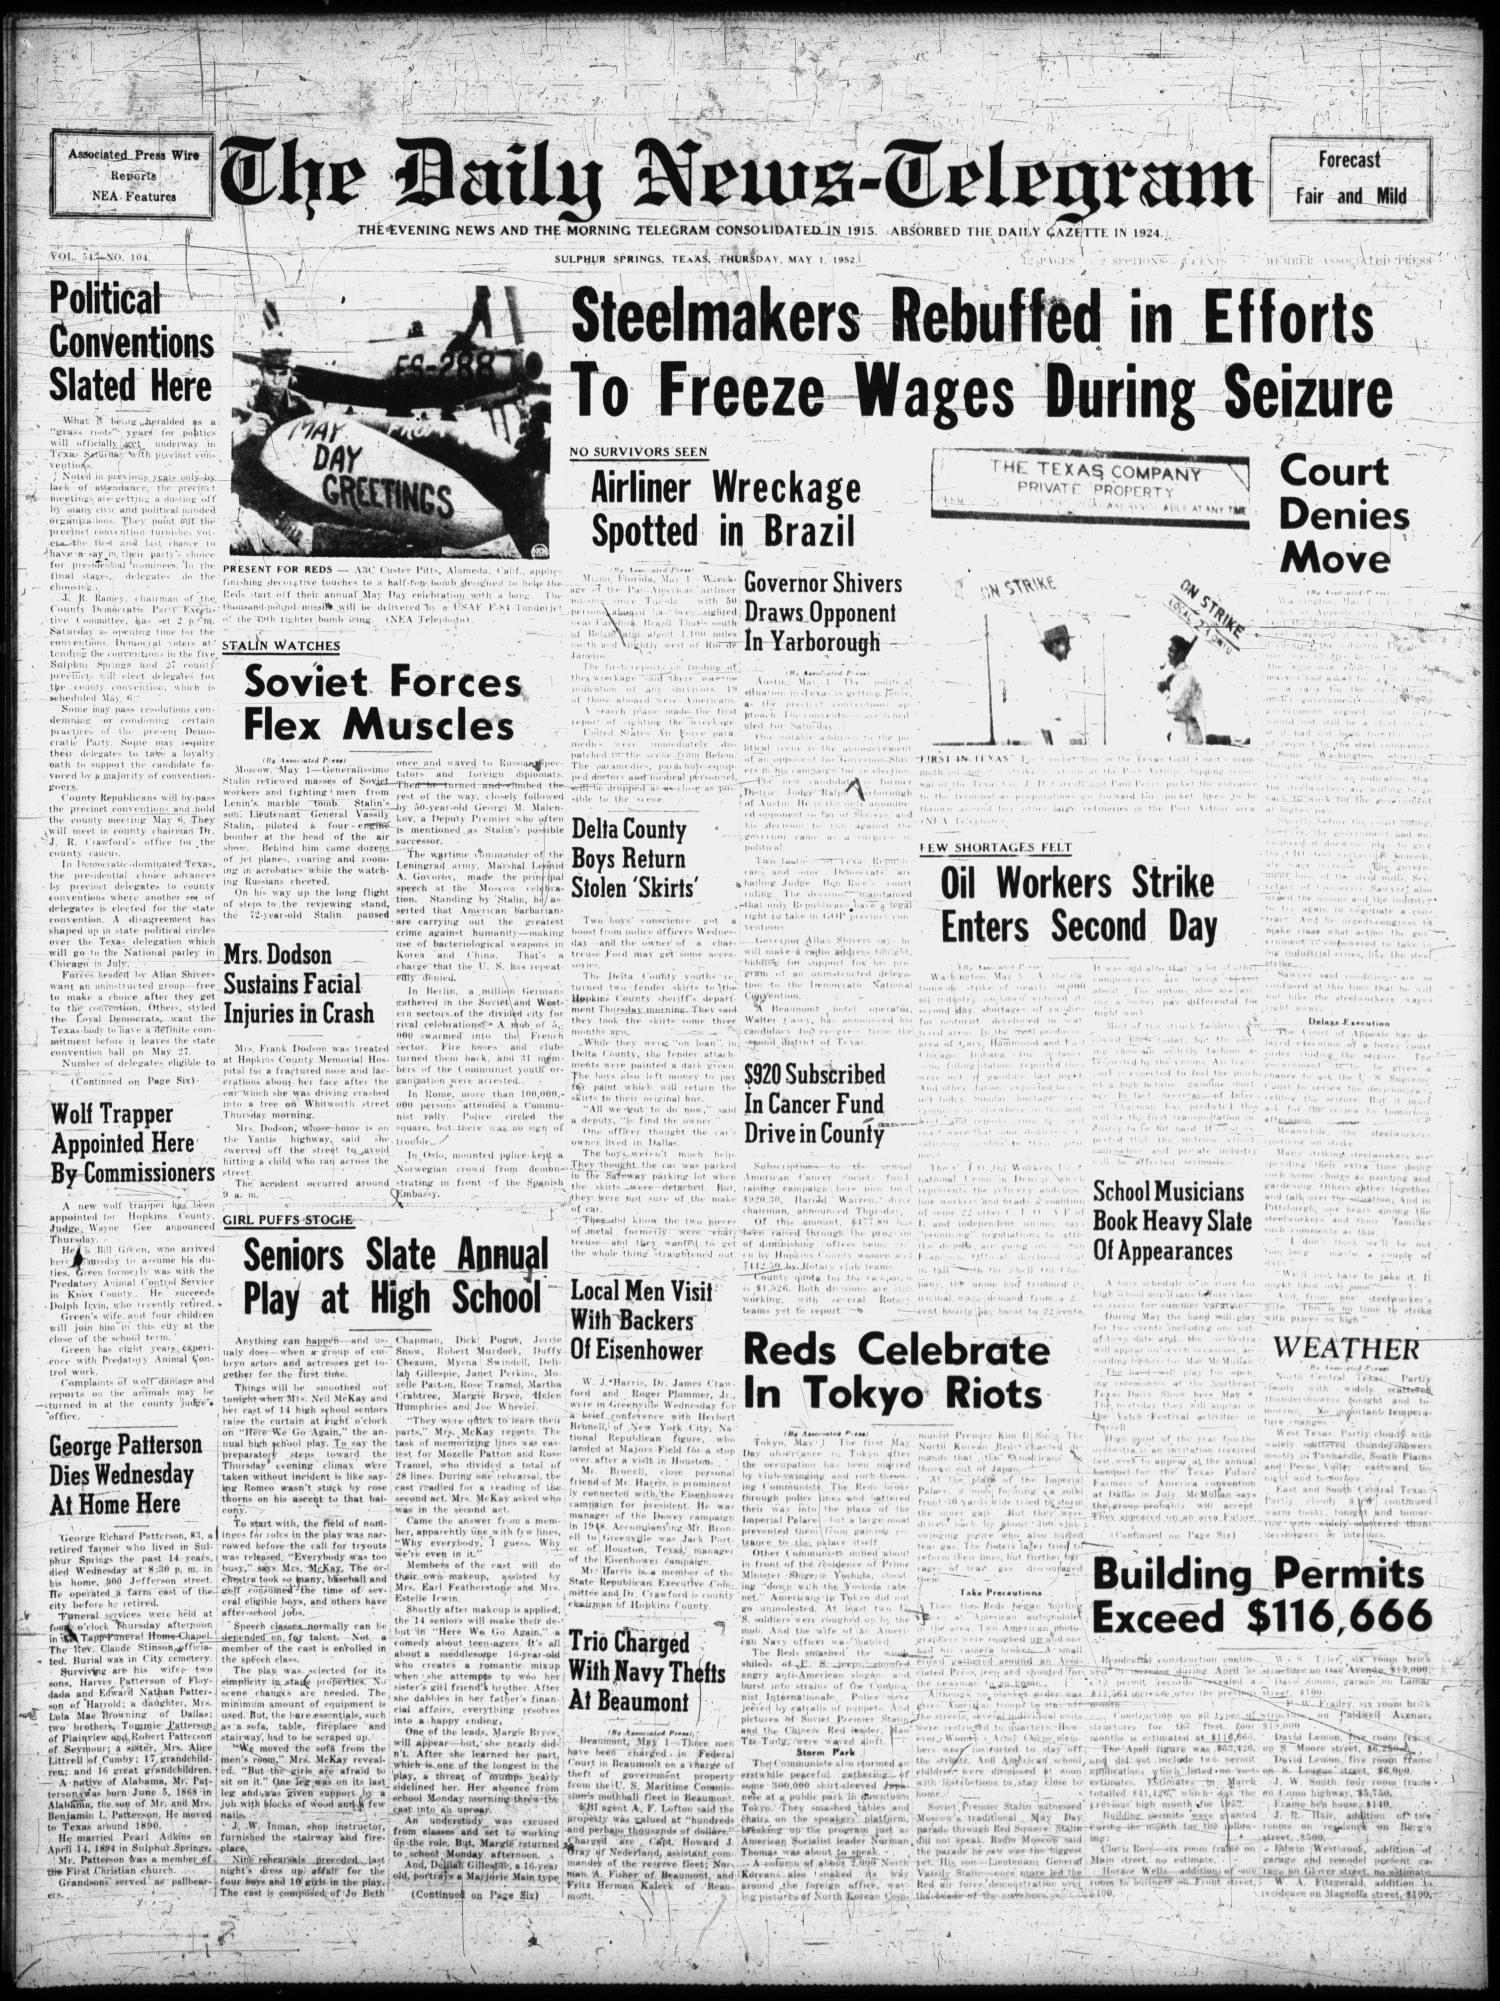 The Daily News Telegram Sulphur Springs Tex Vol 54 No 104 Ed 1 Thursday May 1952